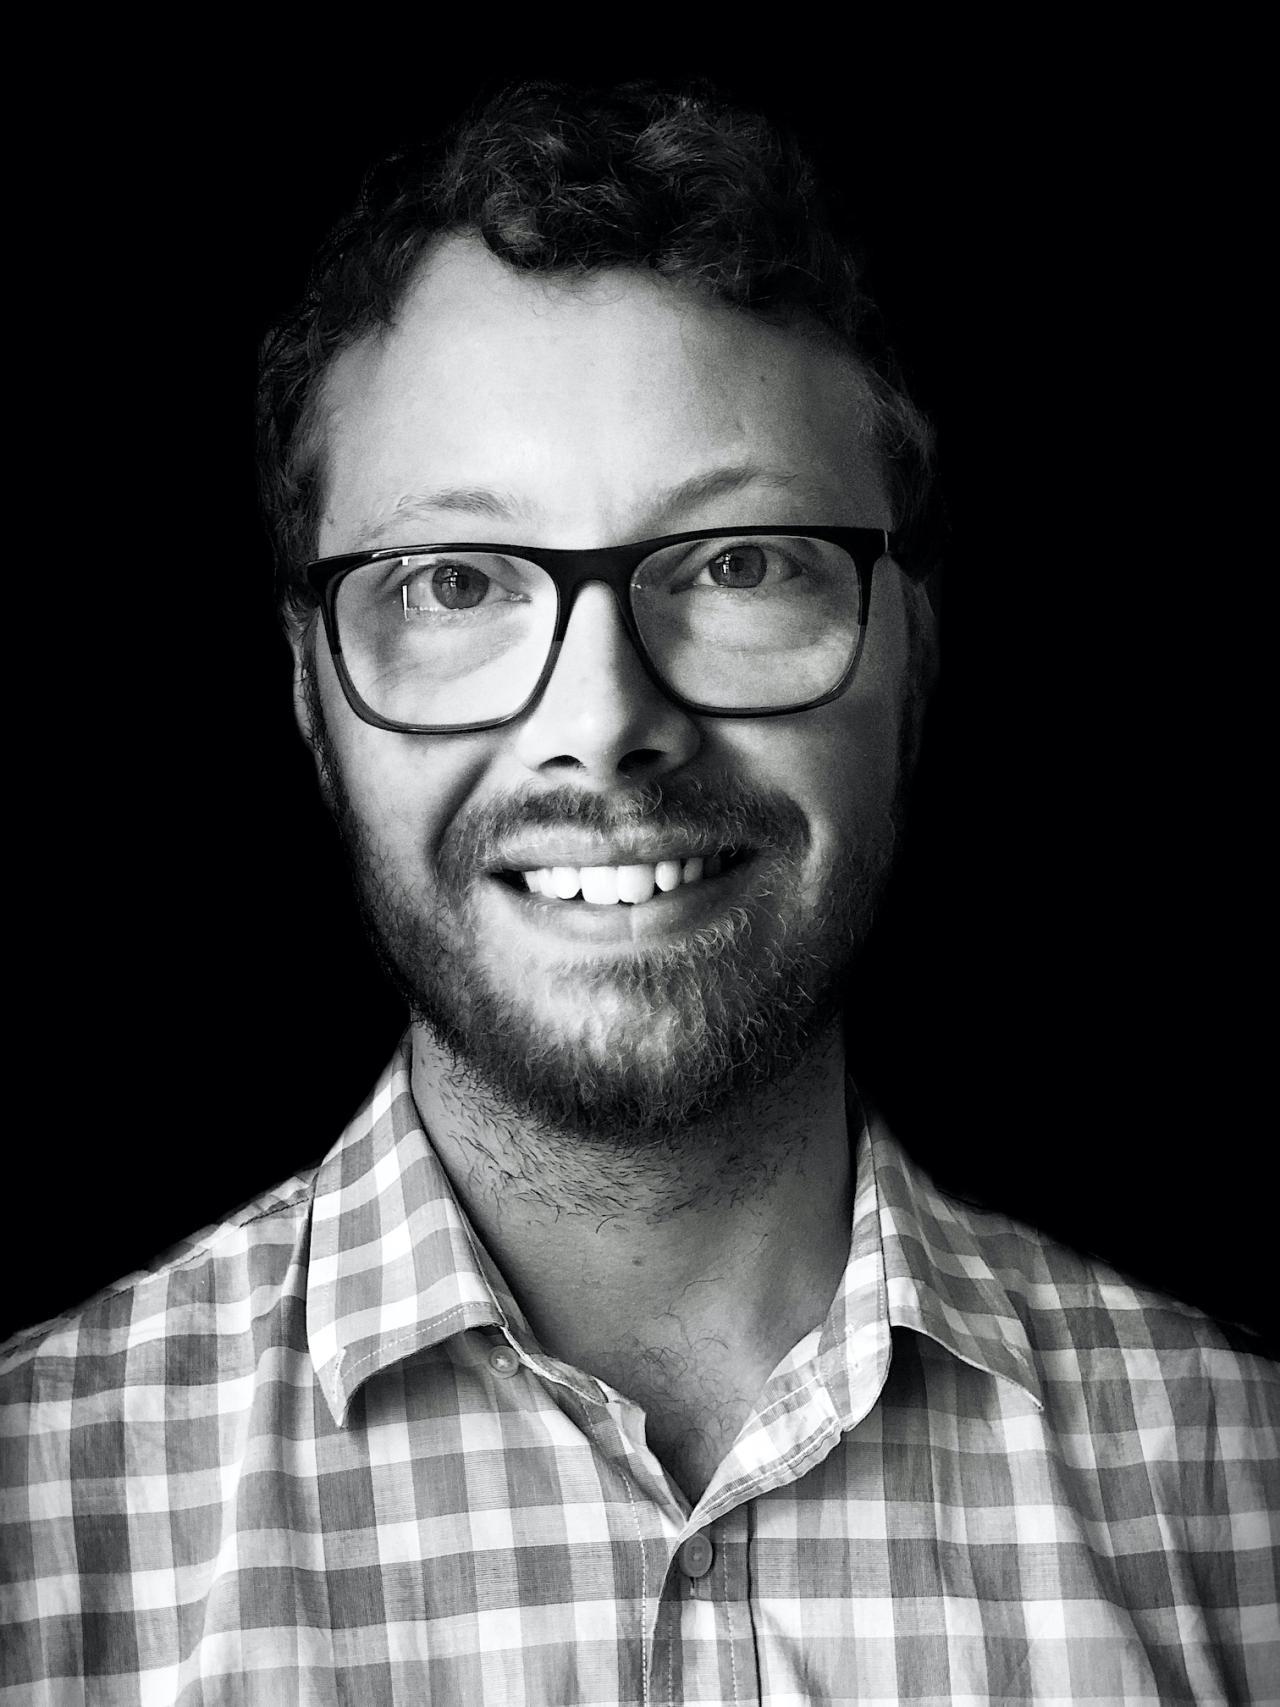 Christoffer Holmgård